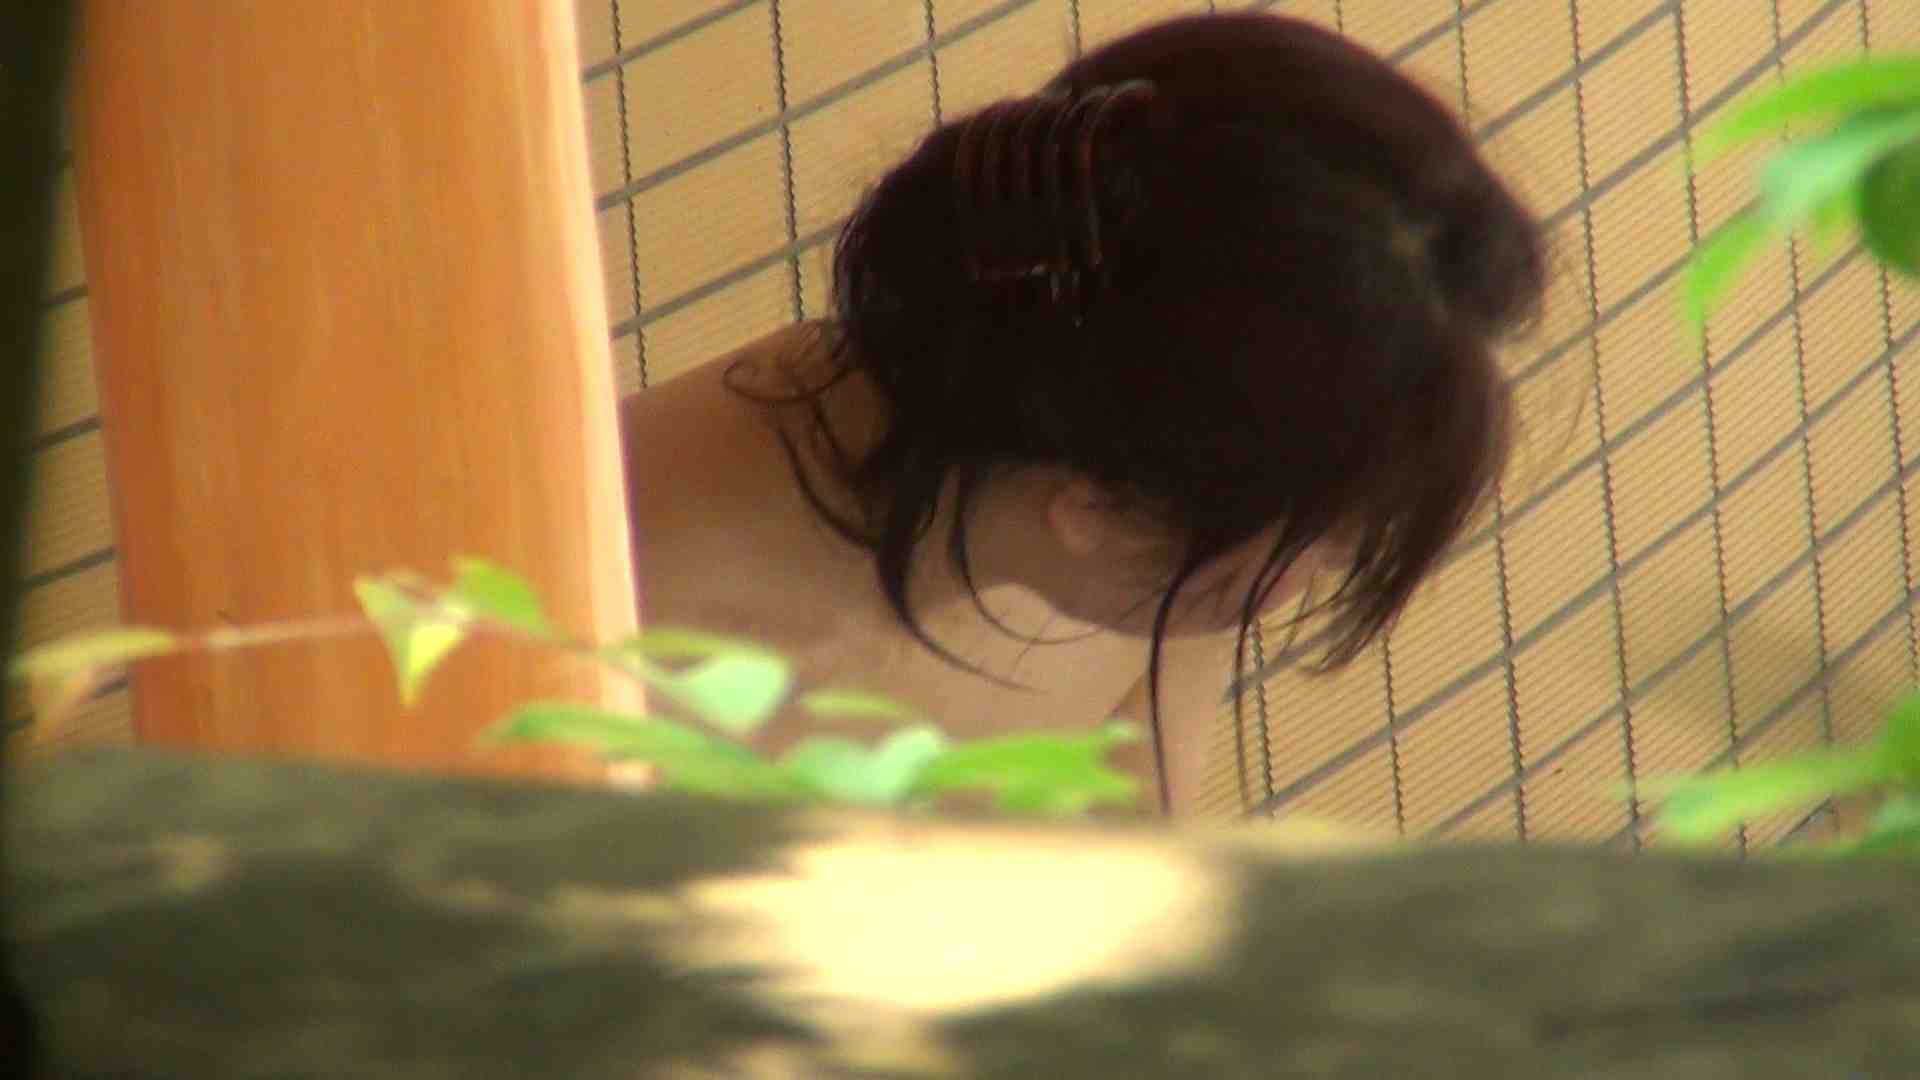 Vol.78 熟しても可愛らしさ残る年増 美女 AV無料動画キャプチャ 58画像 7